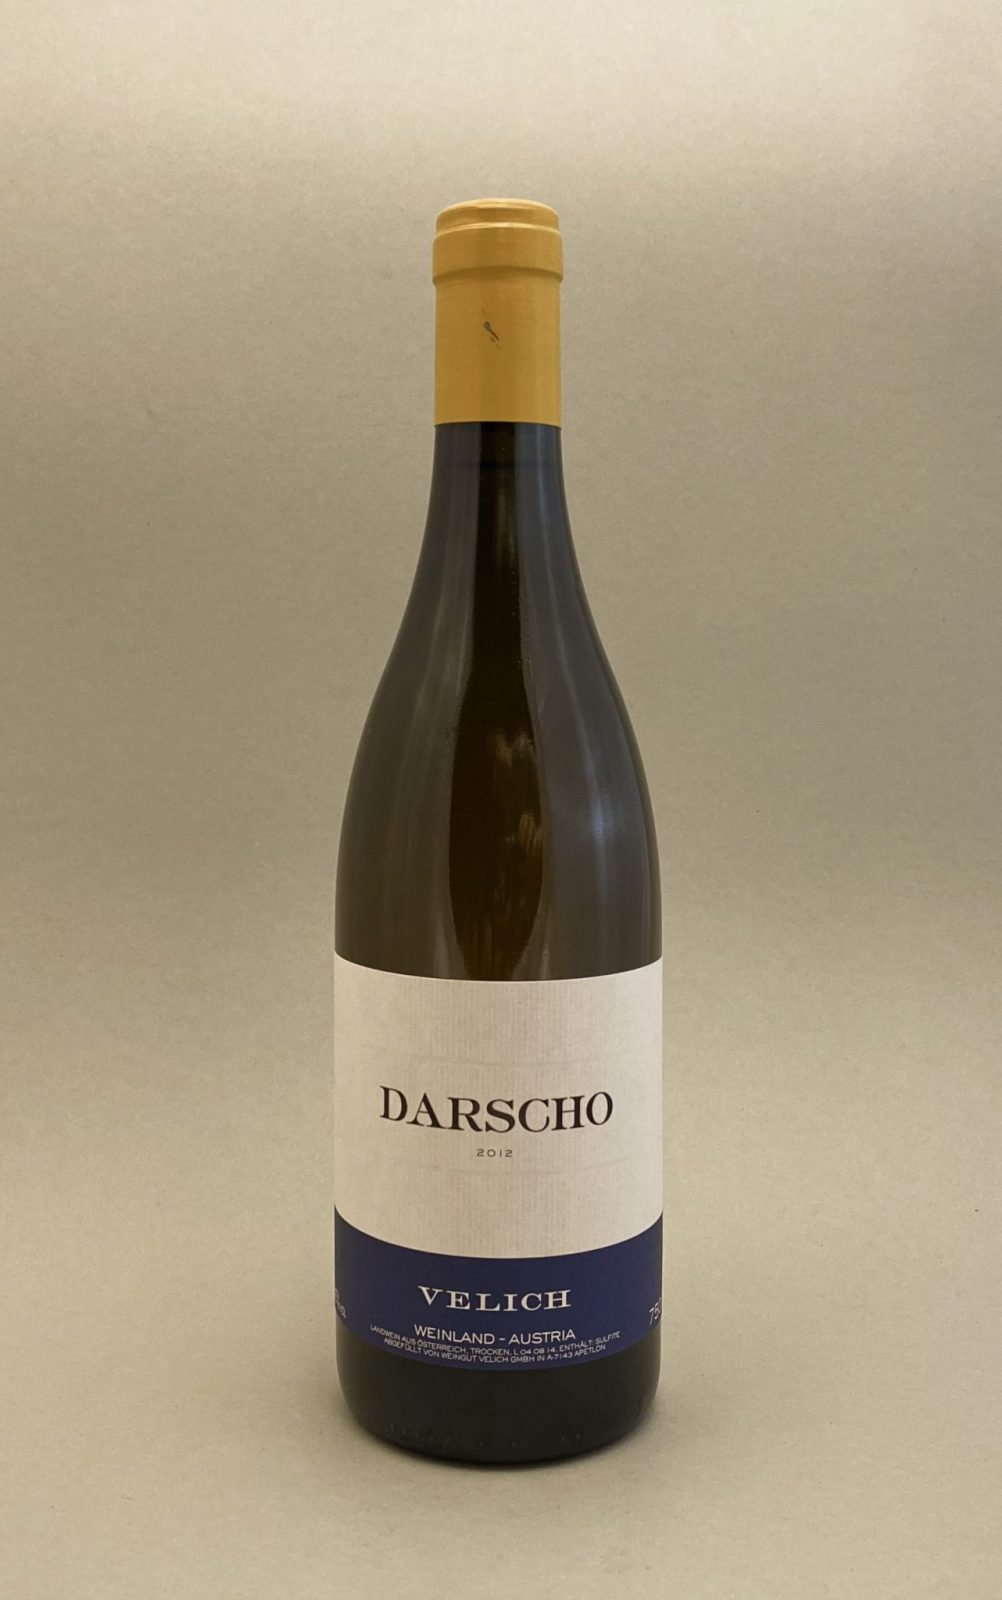 DARSCHO Chardonnay 2012, vinoteka Sunny wines slnecnice mesto, Bratislava petrzalka, vino biele z Rakúska